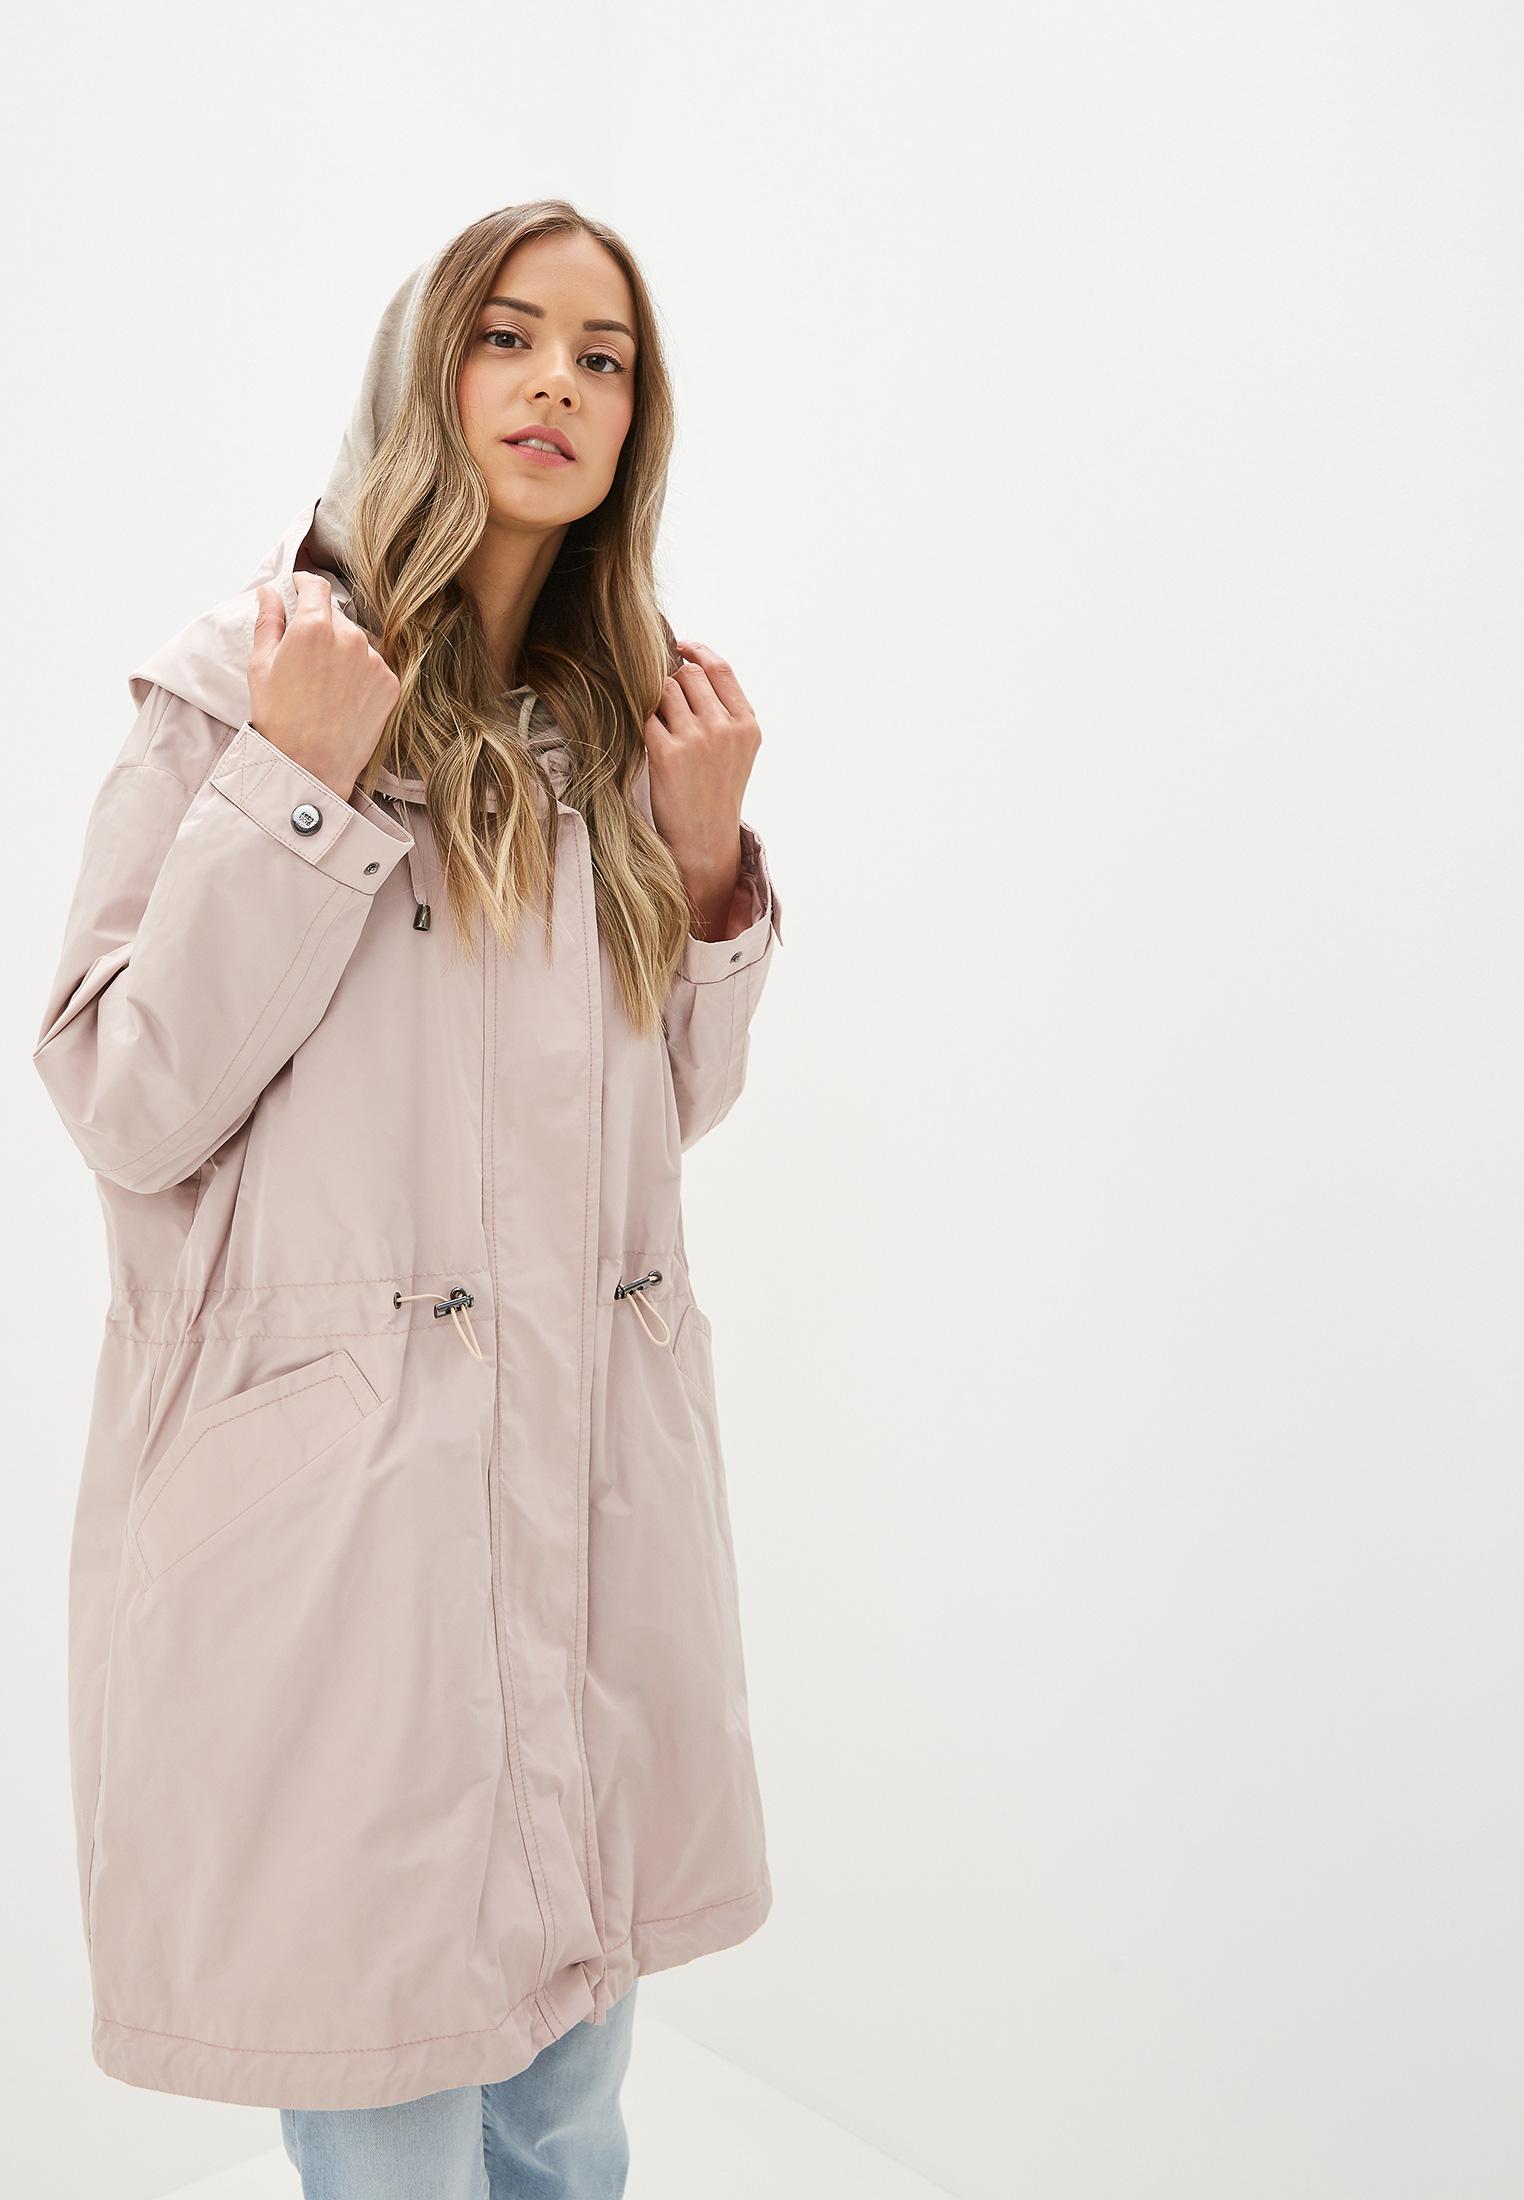 Плащ, Dixi-Coat, цвет: розовый. Артикул: MP002XW01QBV. Одежда